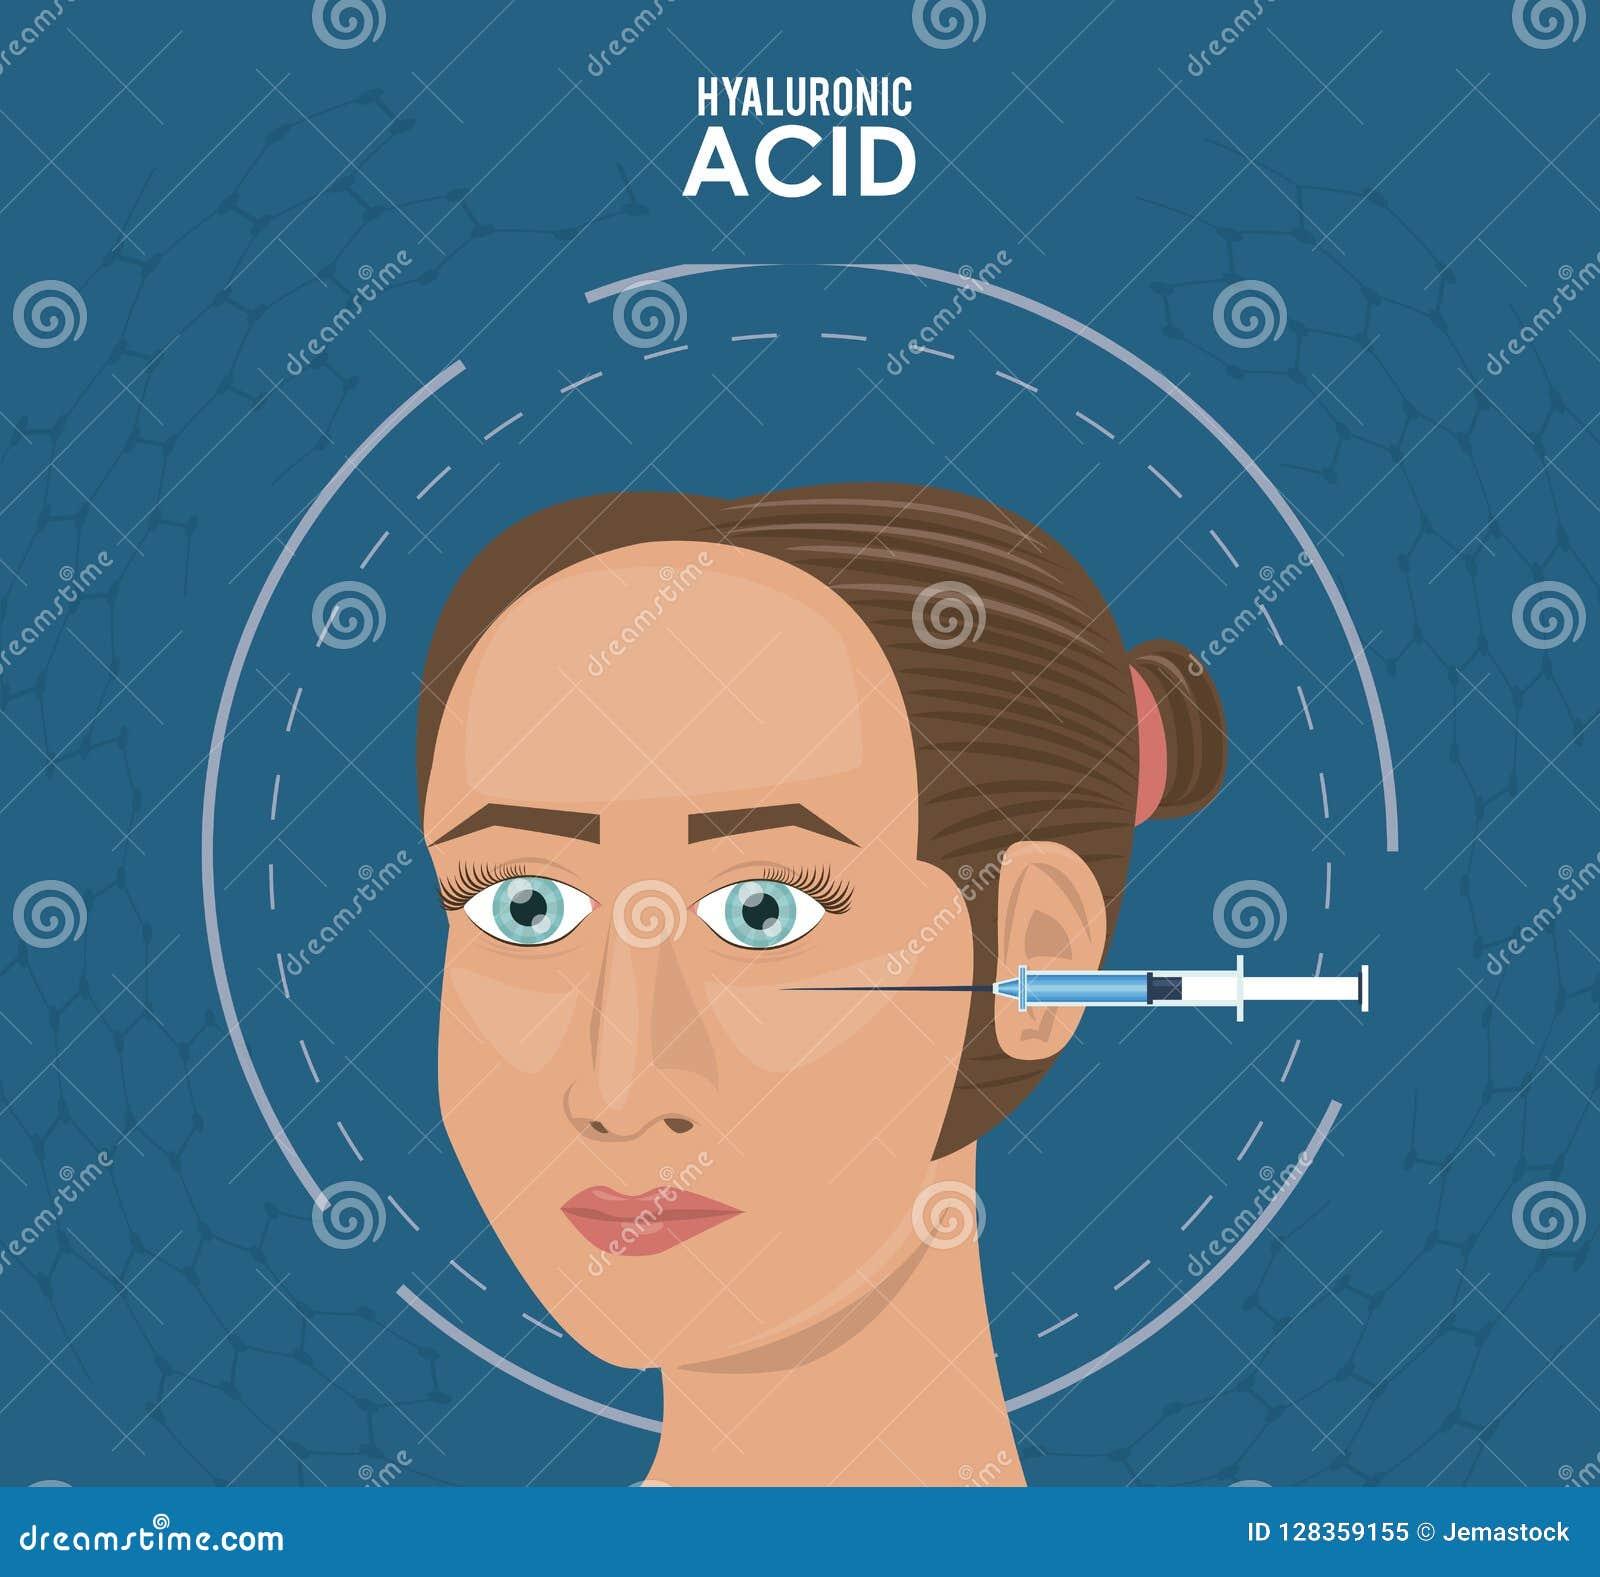 Hyaluronic Acid Filler Injection Infographic Flyer Stock